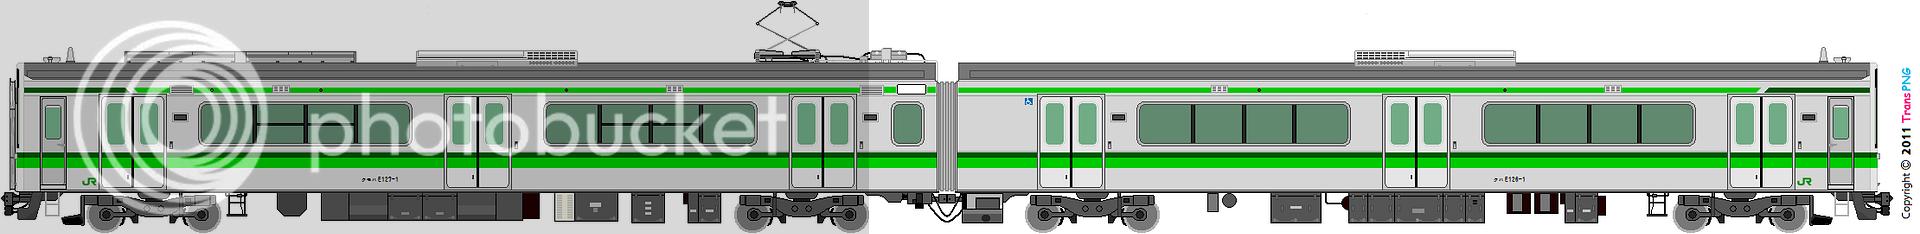 Train 2273